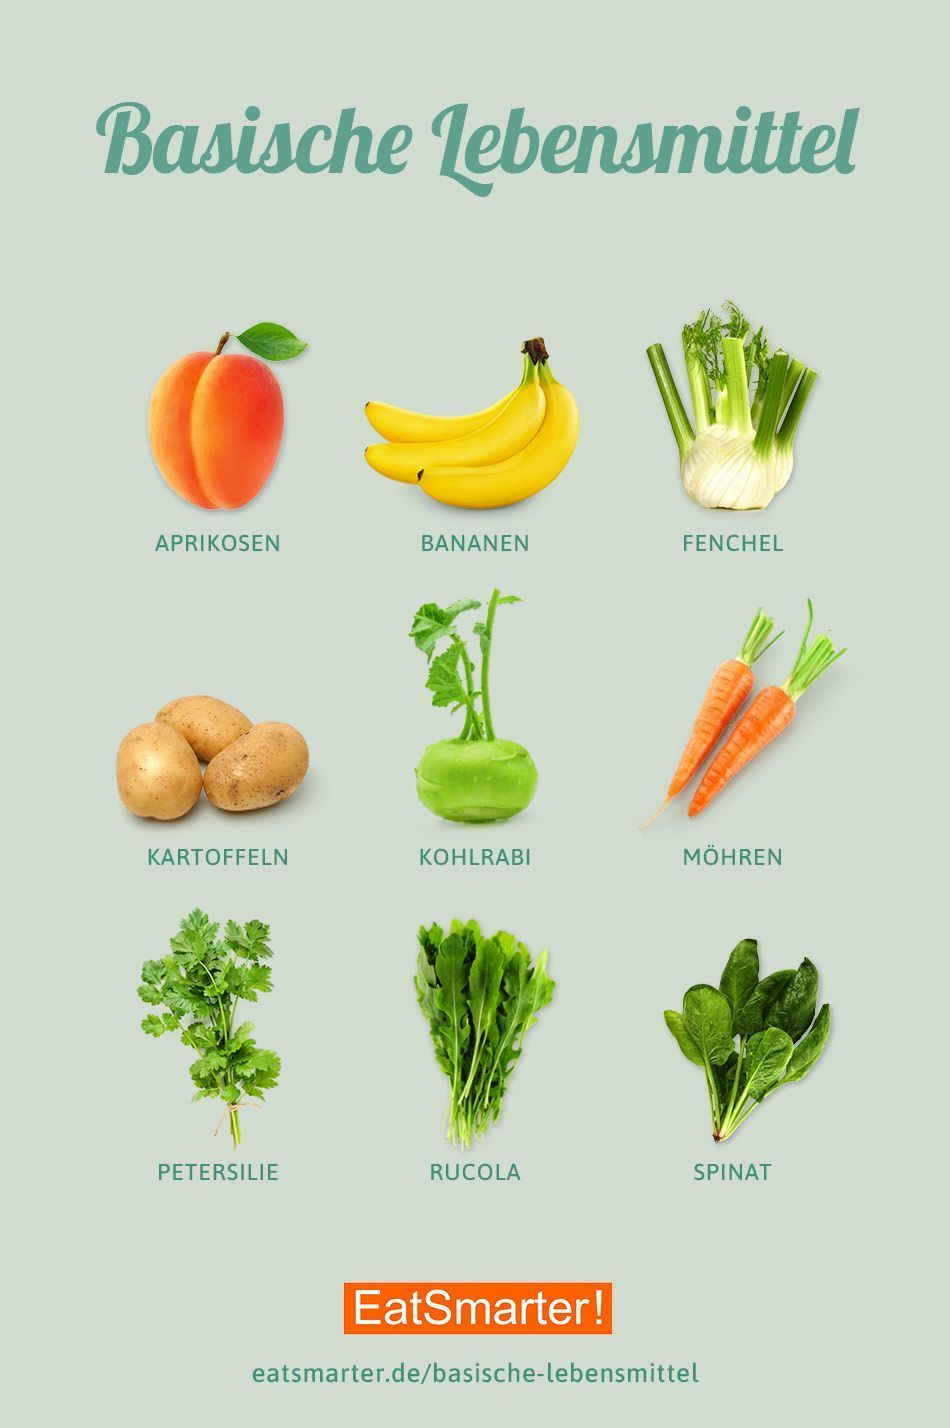 Top 8 fettverbrennende Lebensmittel